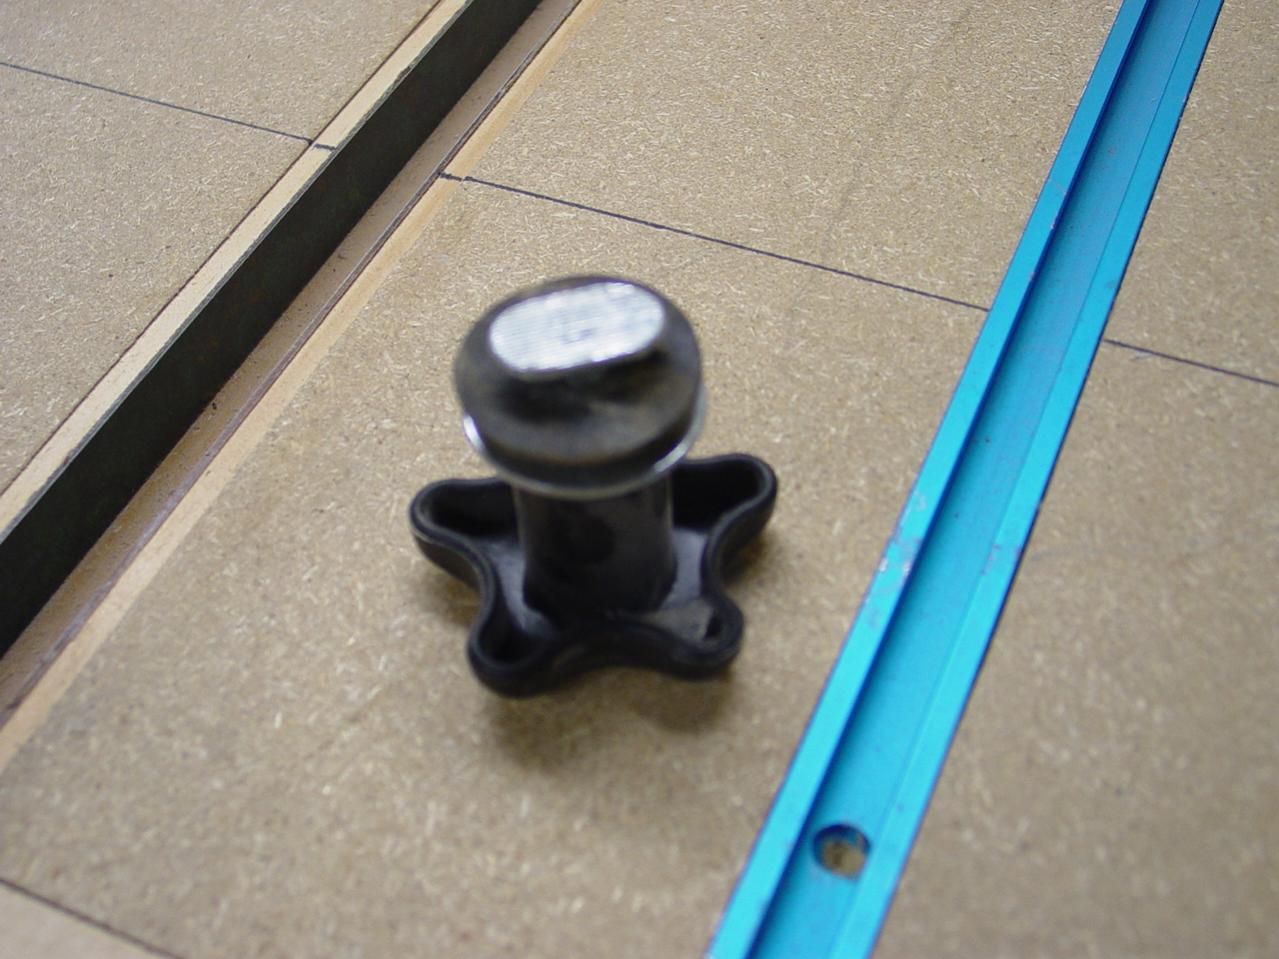 sealing seams in laminate tops-dsc00560.jpg